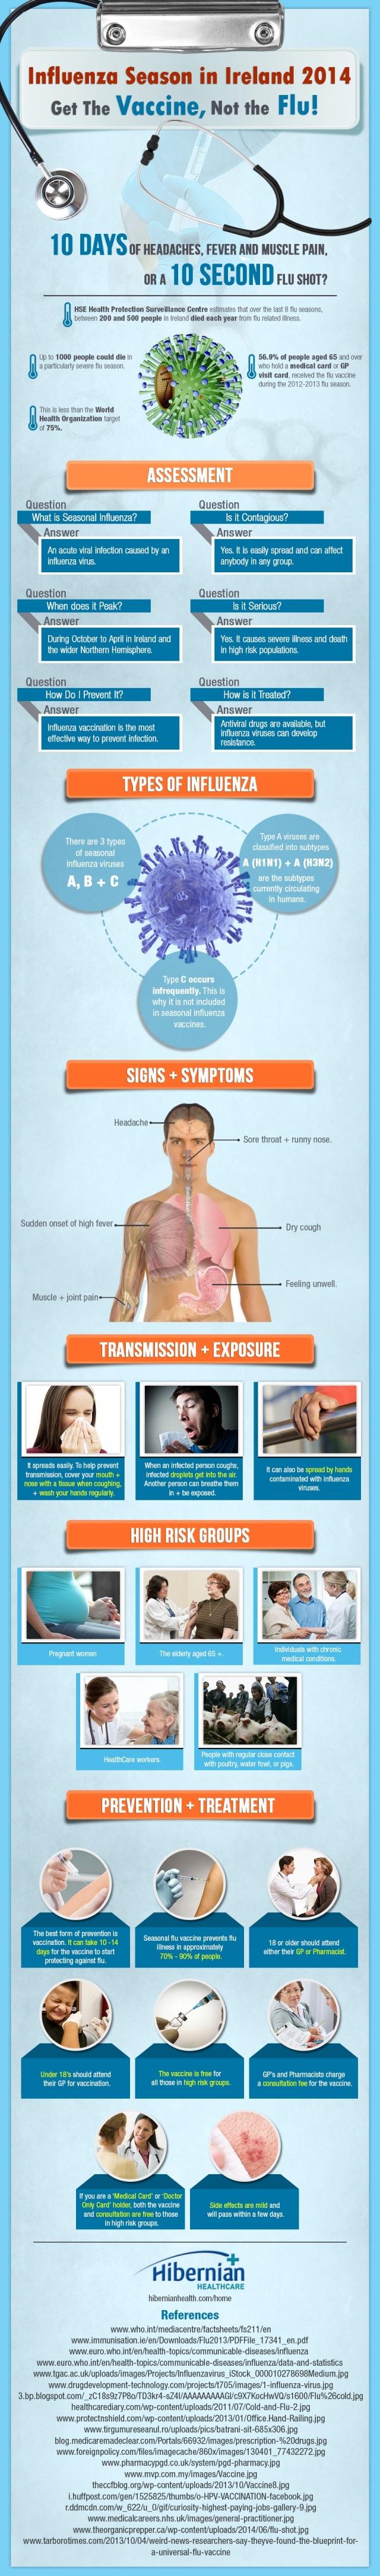 Influenza-Season-in-Ireland-Infographic